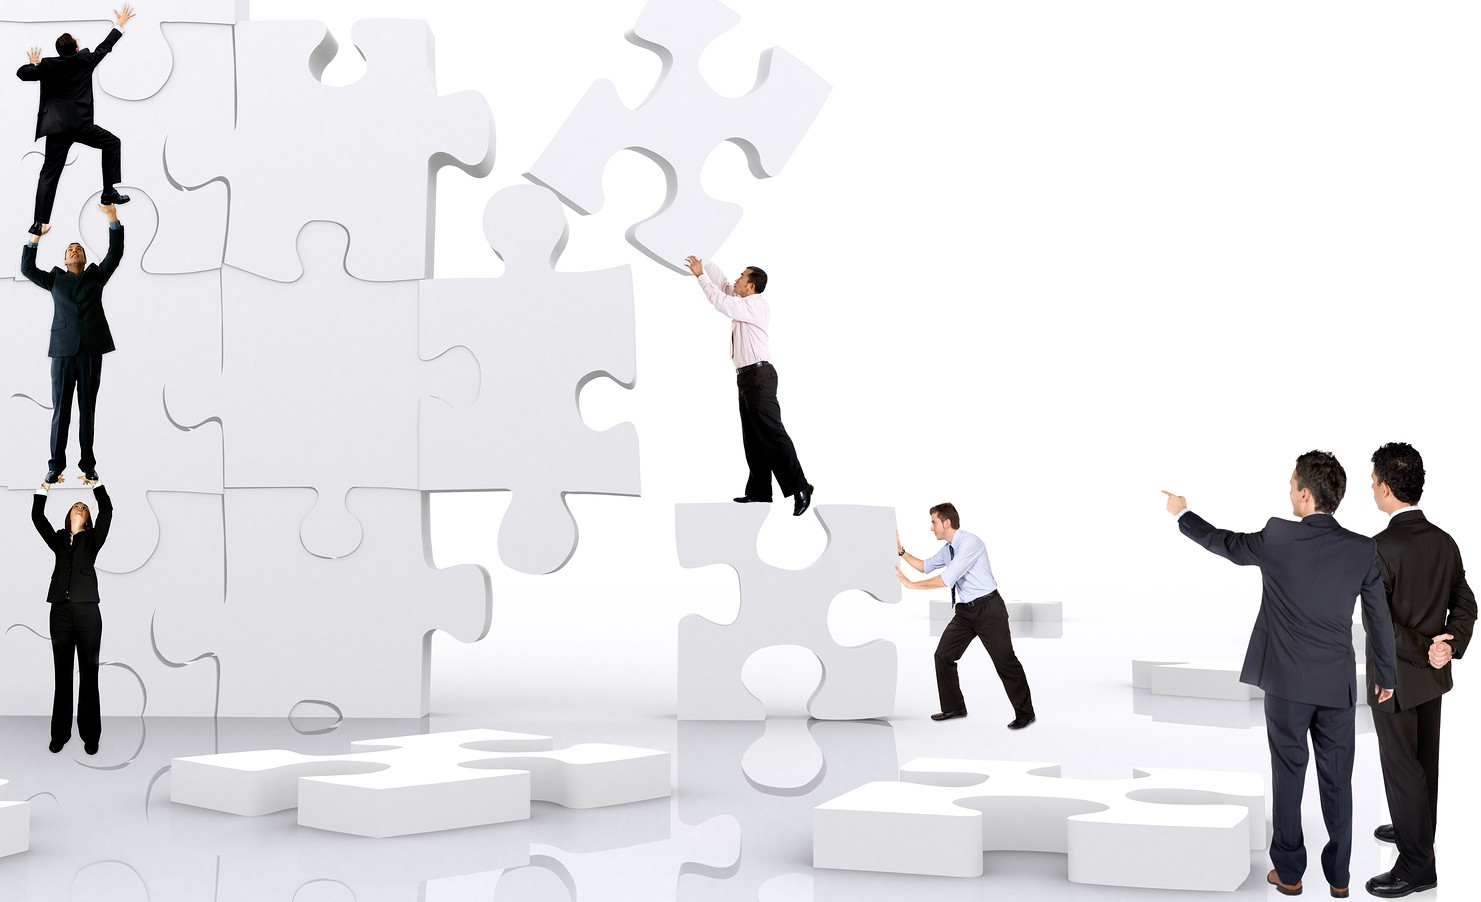 Kennenlernen teambuilding